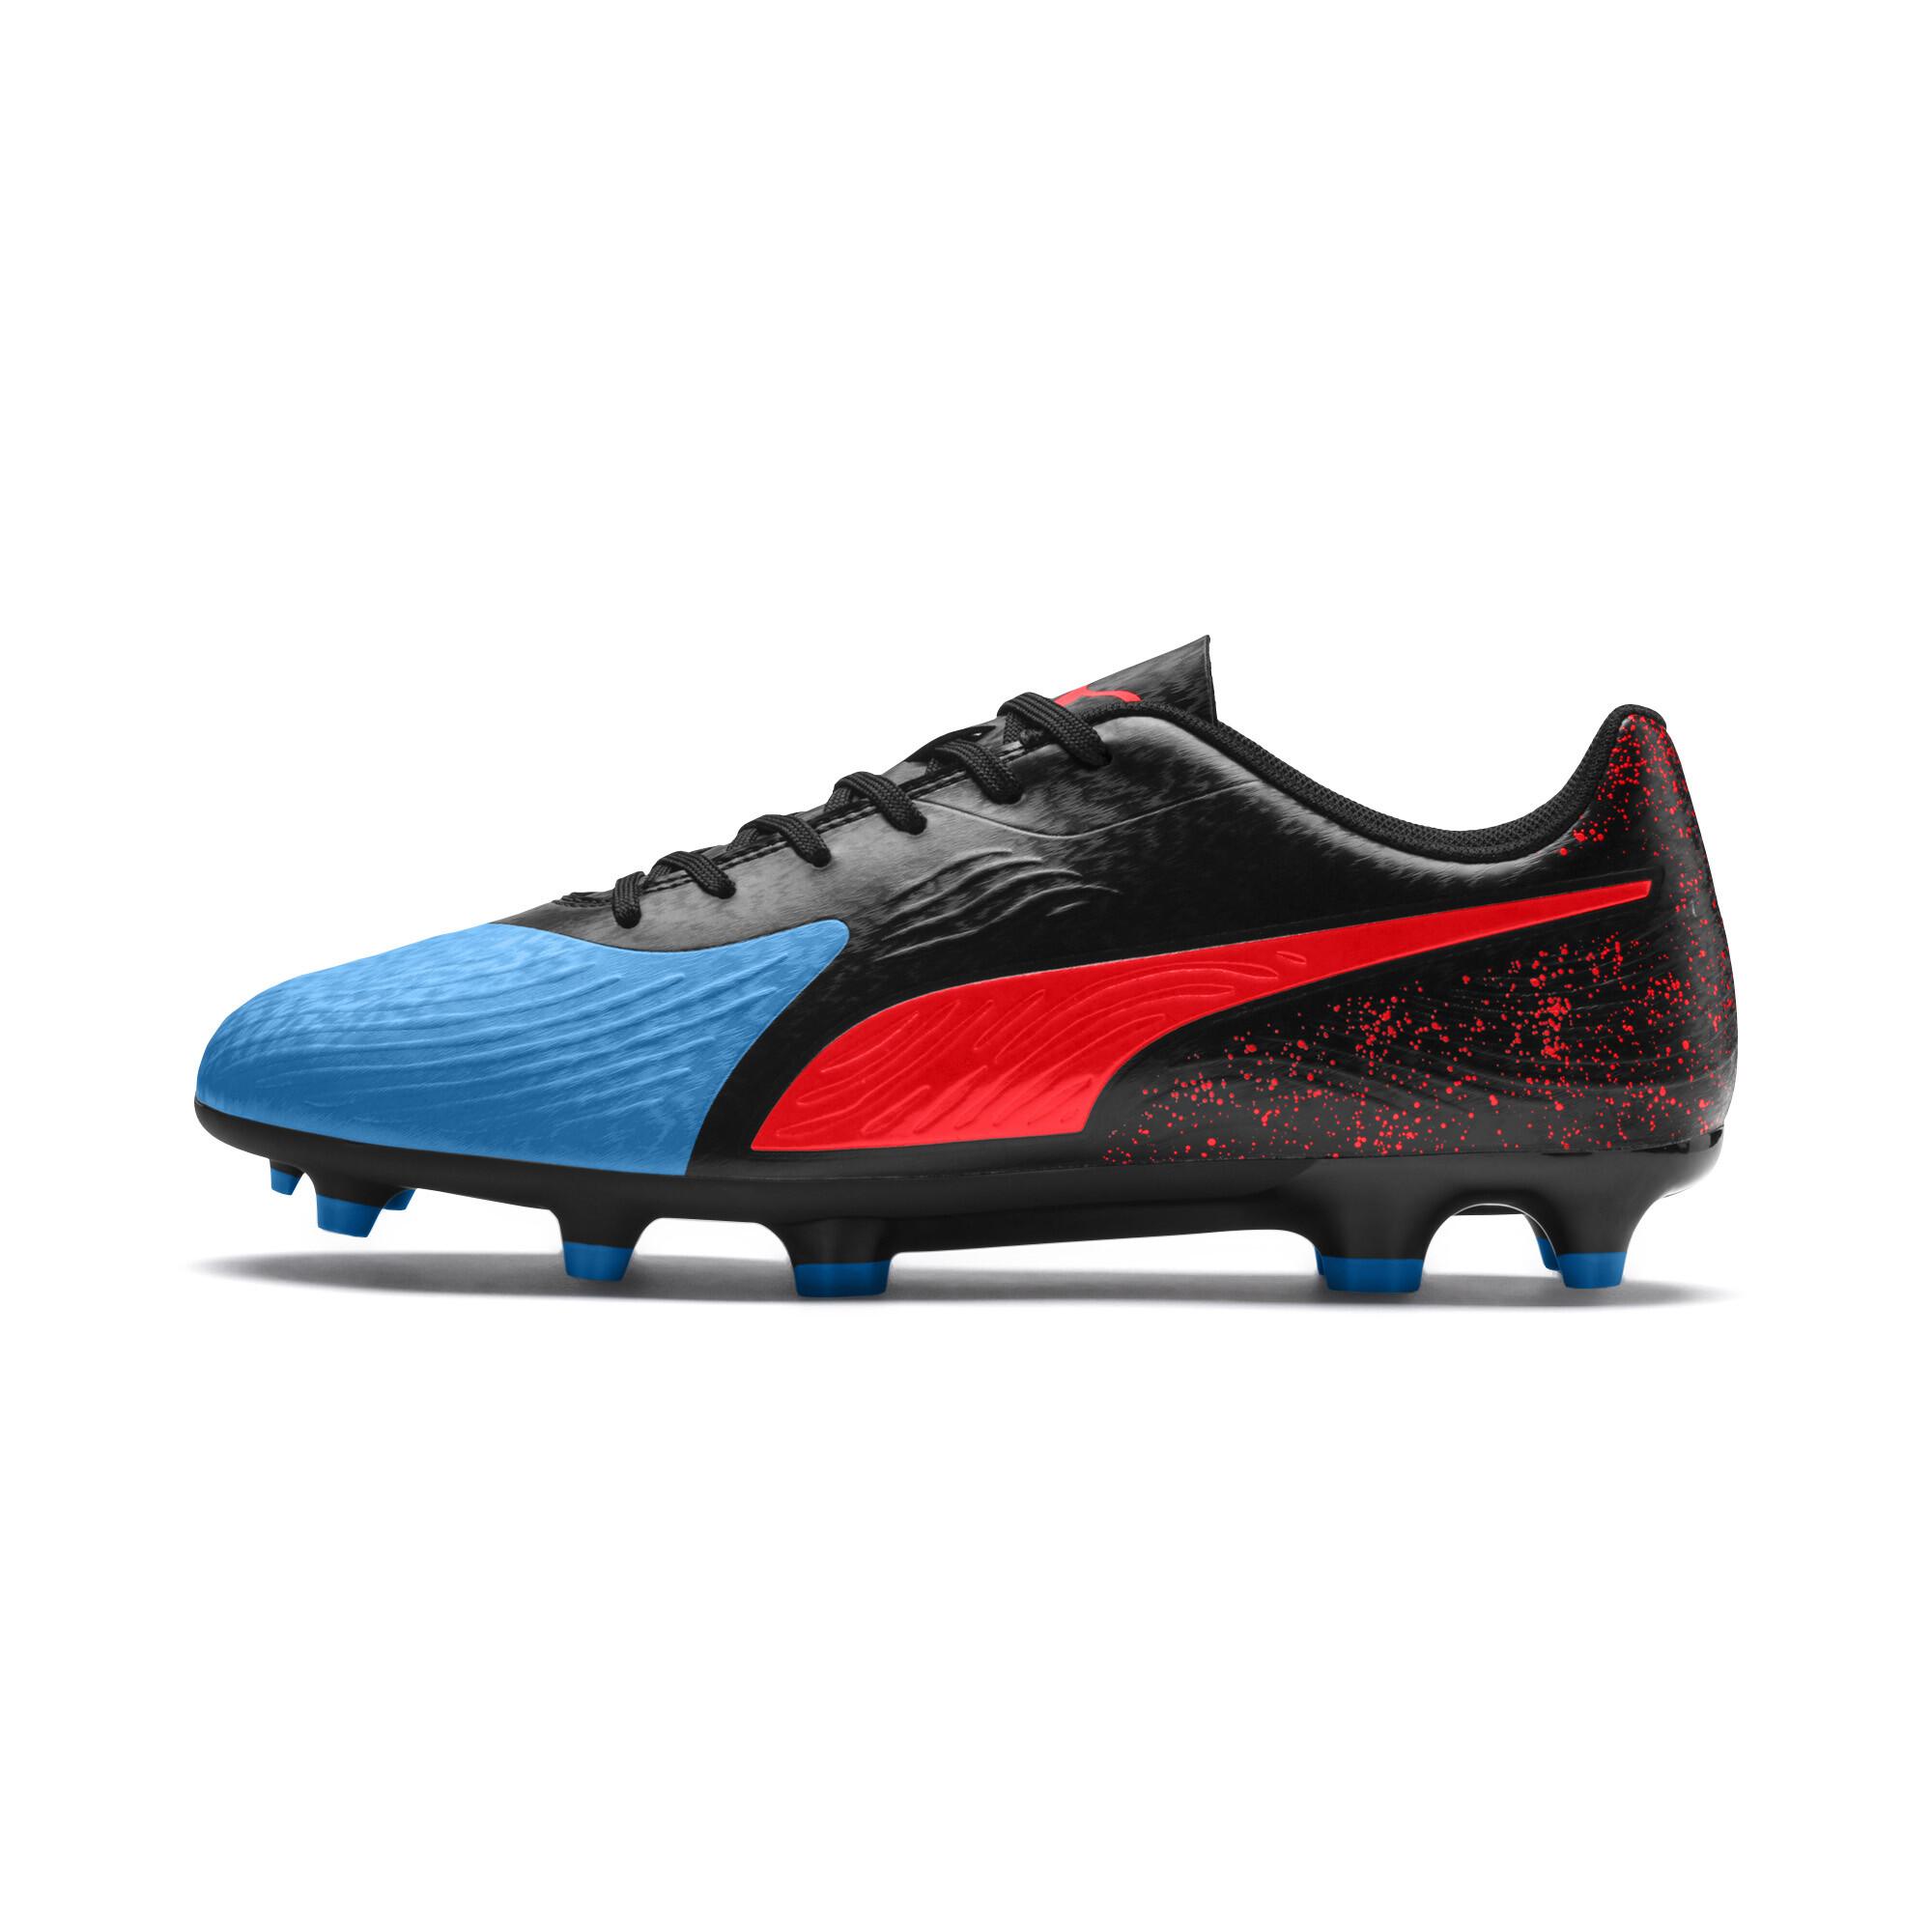 Image Puma PUMA ONE 19.4 FG/AG Men's Football Boots #1